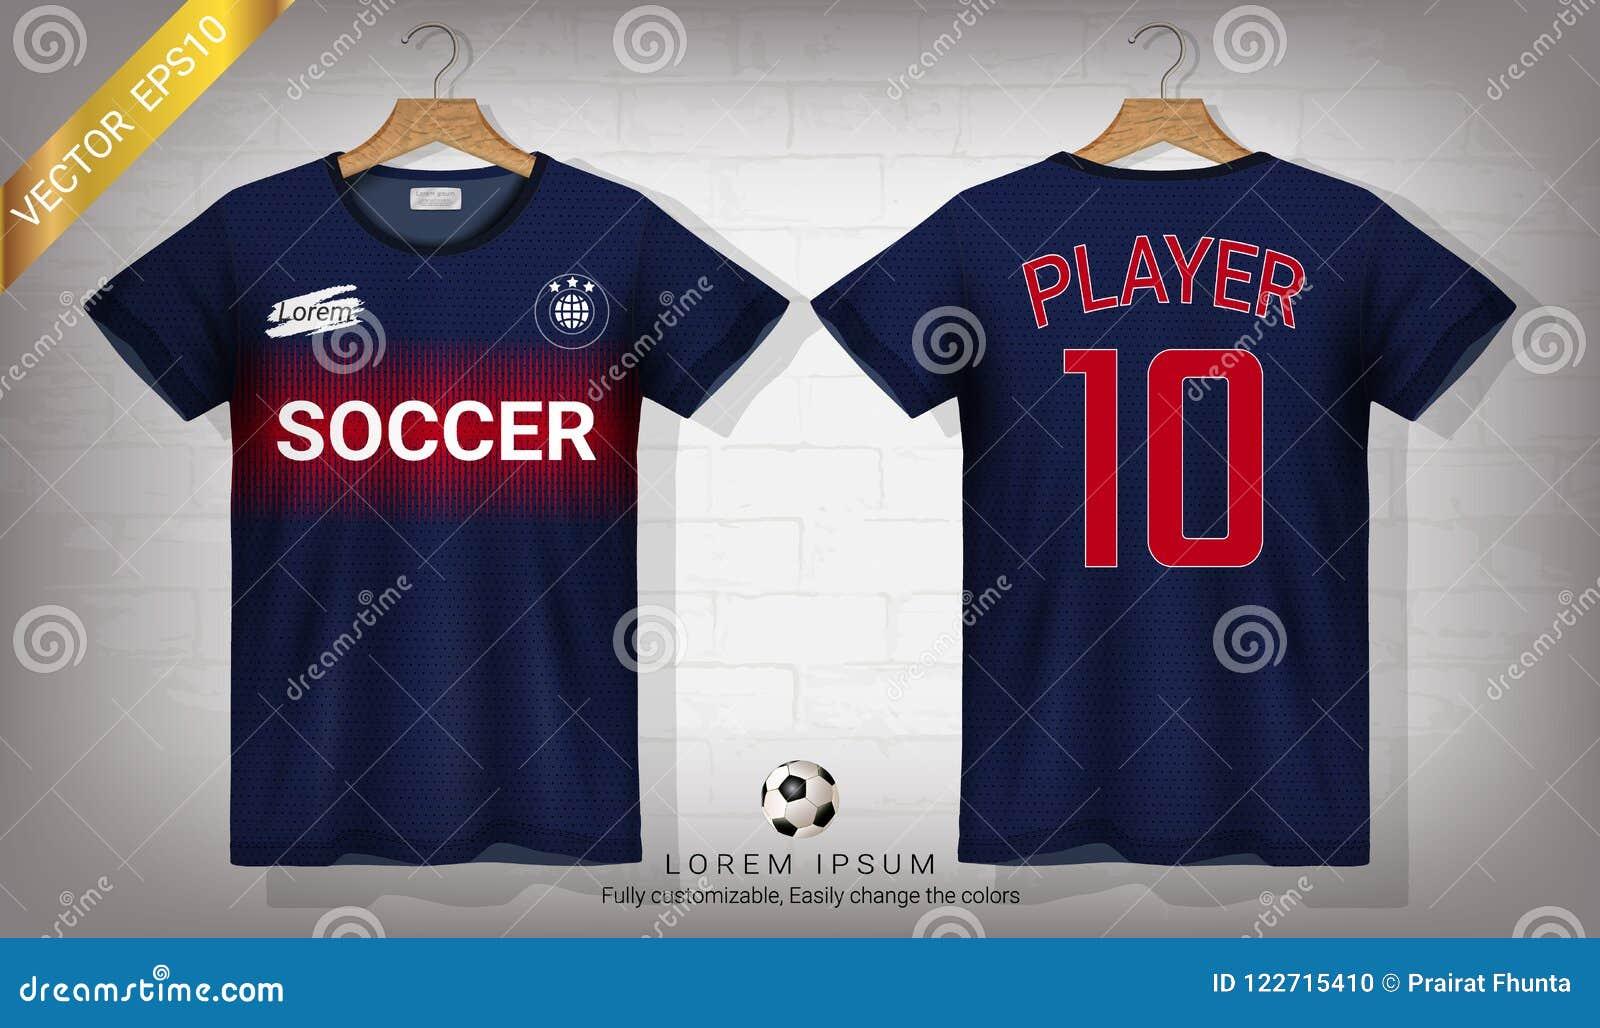 Soccer T Shirts Designs Bcd Tofu House